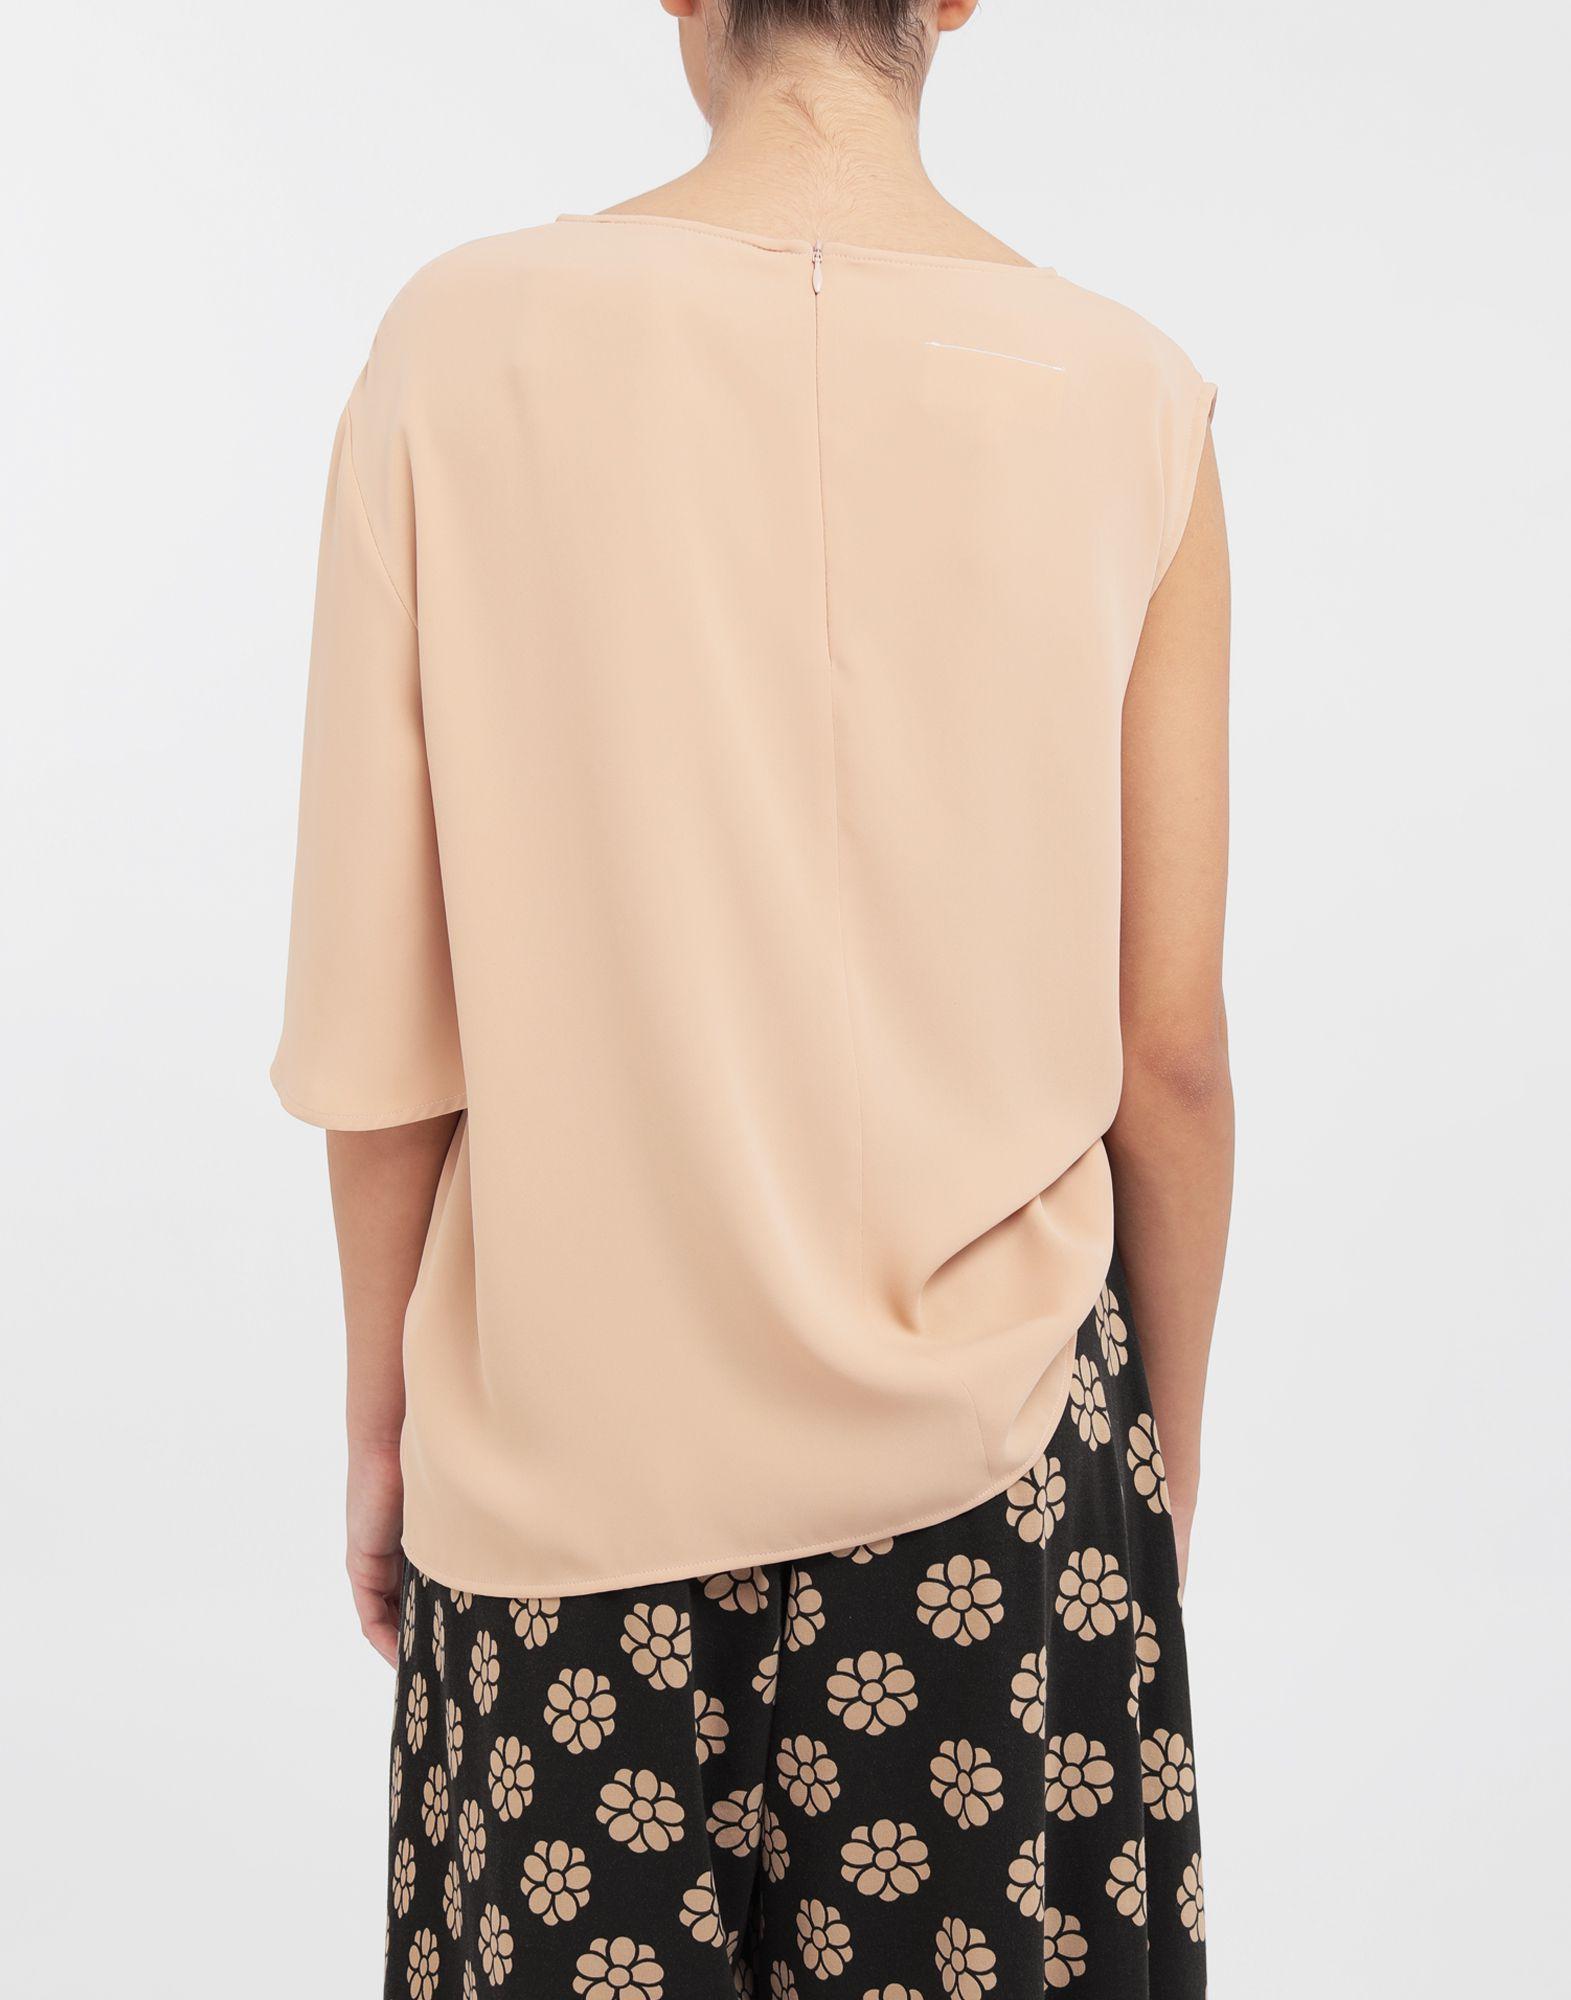 MM6 MAISON MARGIELA Asymmetrical jersey shirt Top Woman e